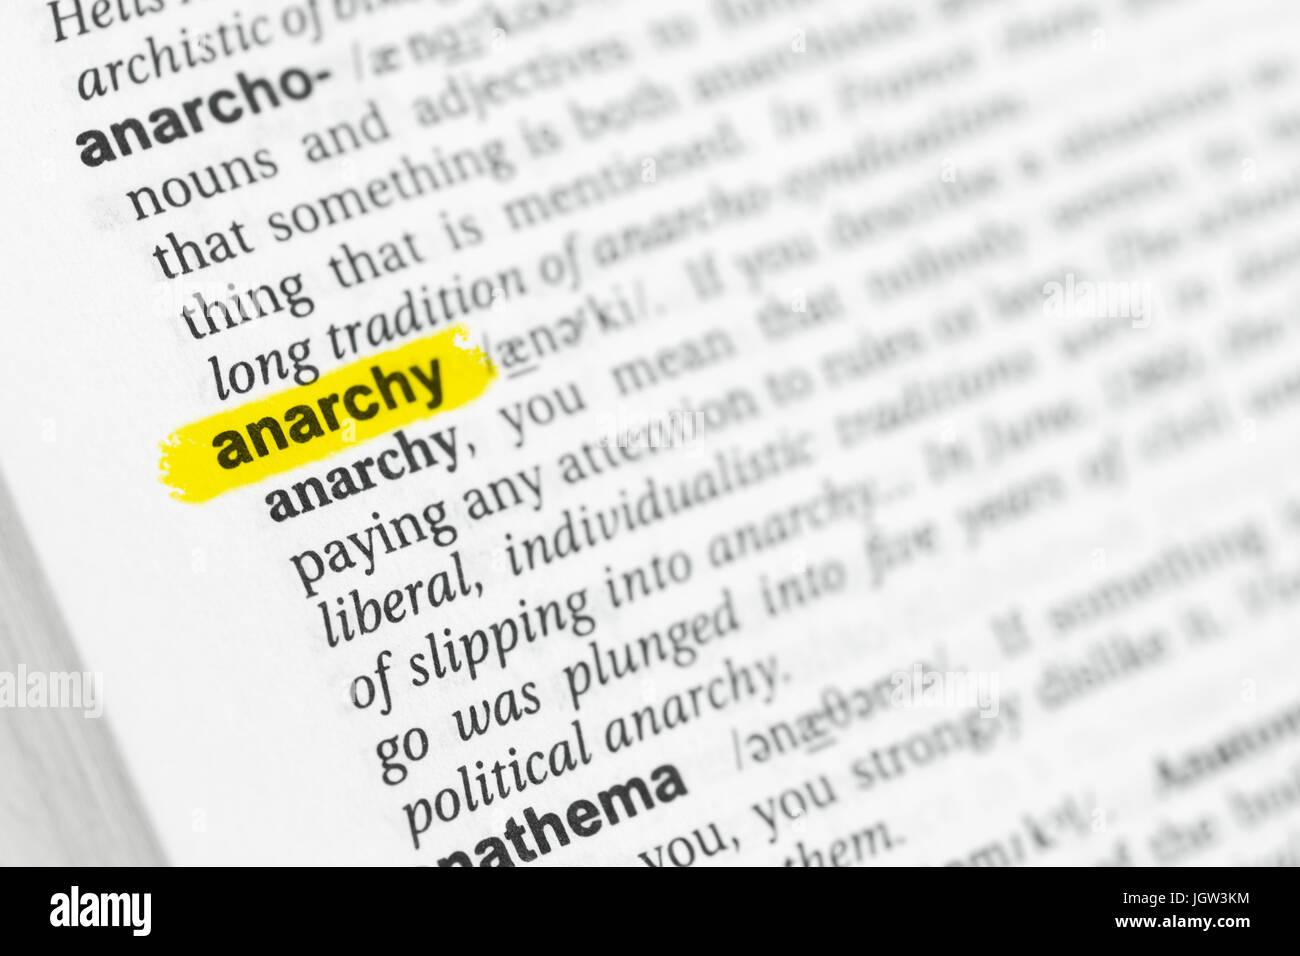 word rebel stock photos & word rebel stock images - alamy